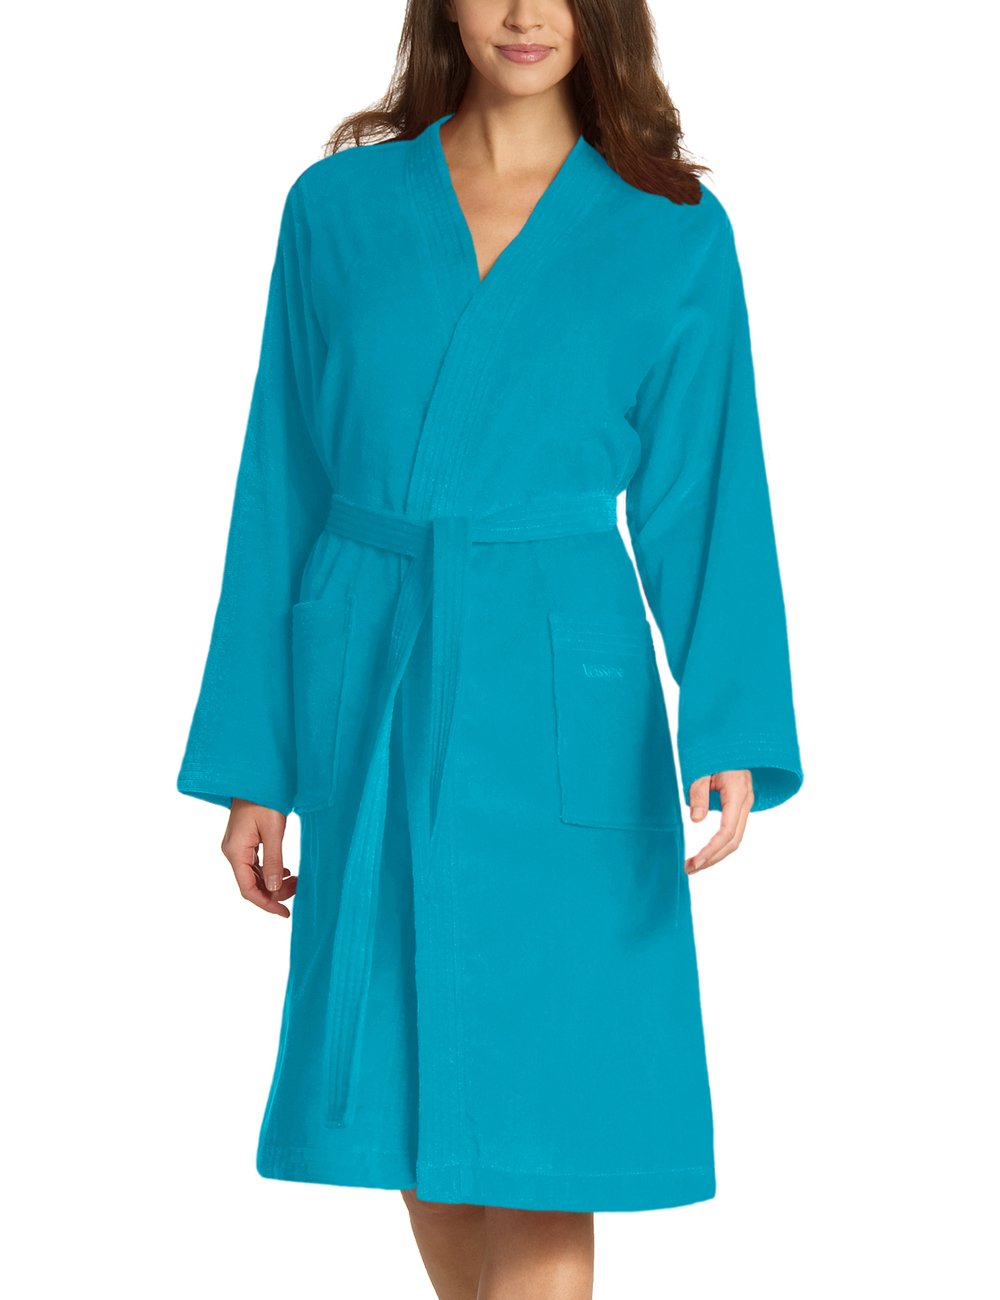 Femme Dallas Bademantel Fabricant VossenPeignoir 34 Bleuturquoise 557Fr36taille PikwXuOTZl